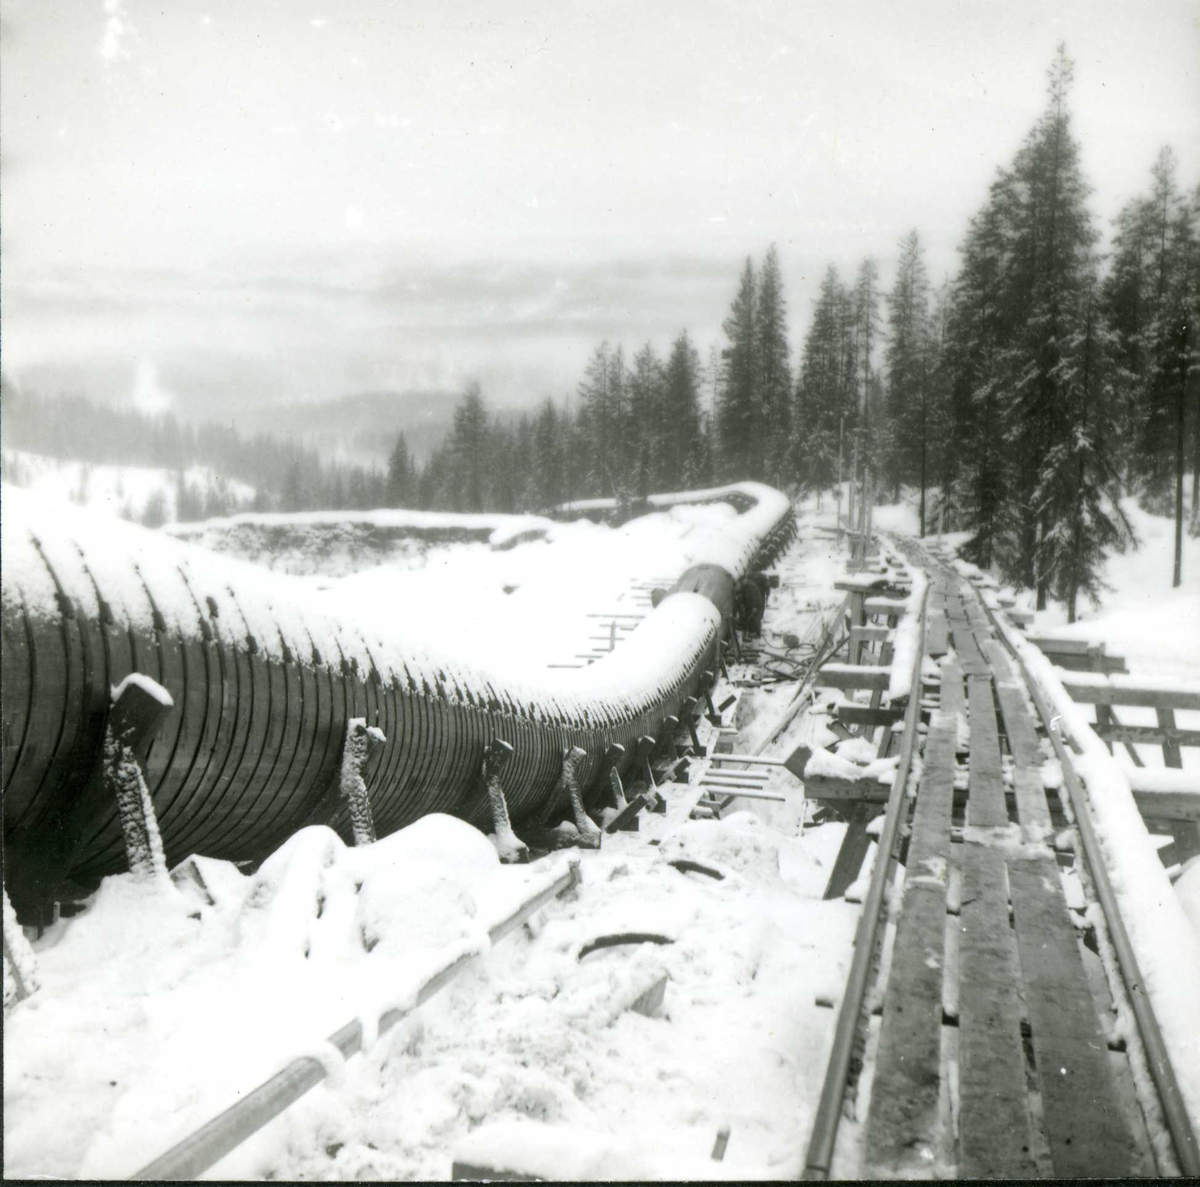 185-3 Hyllandsfossen kraftverk